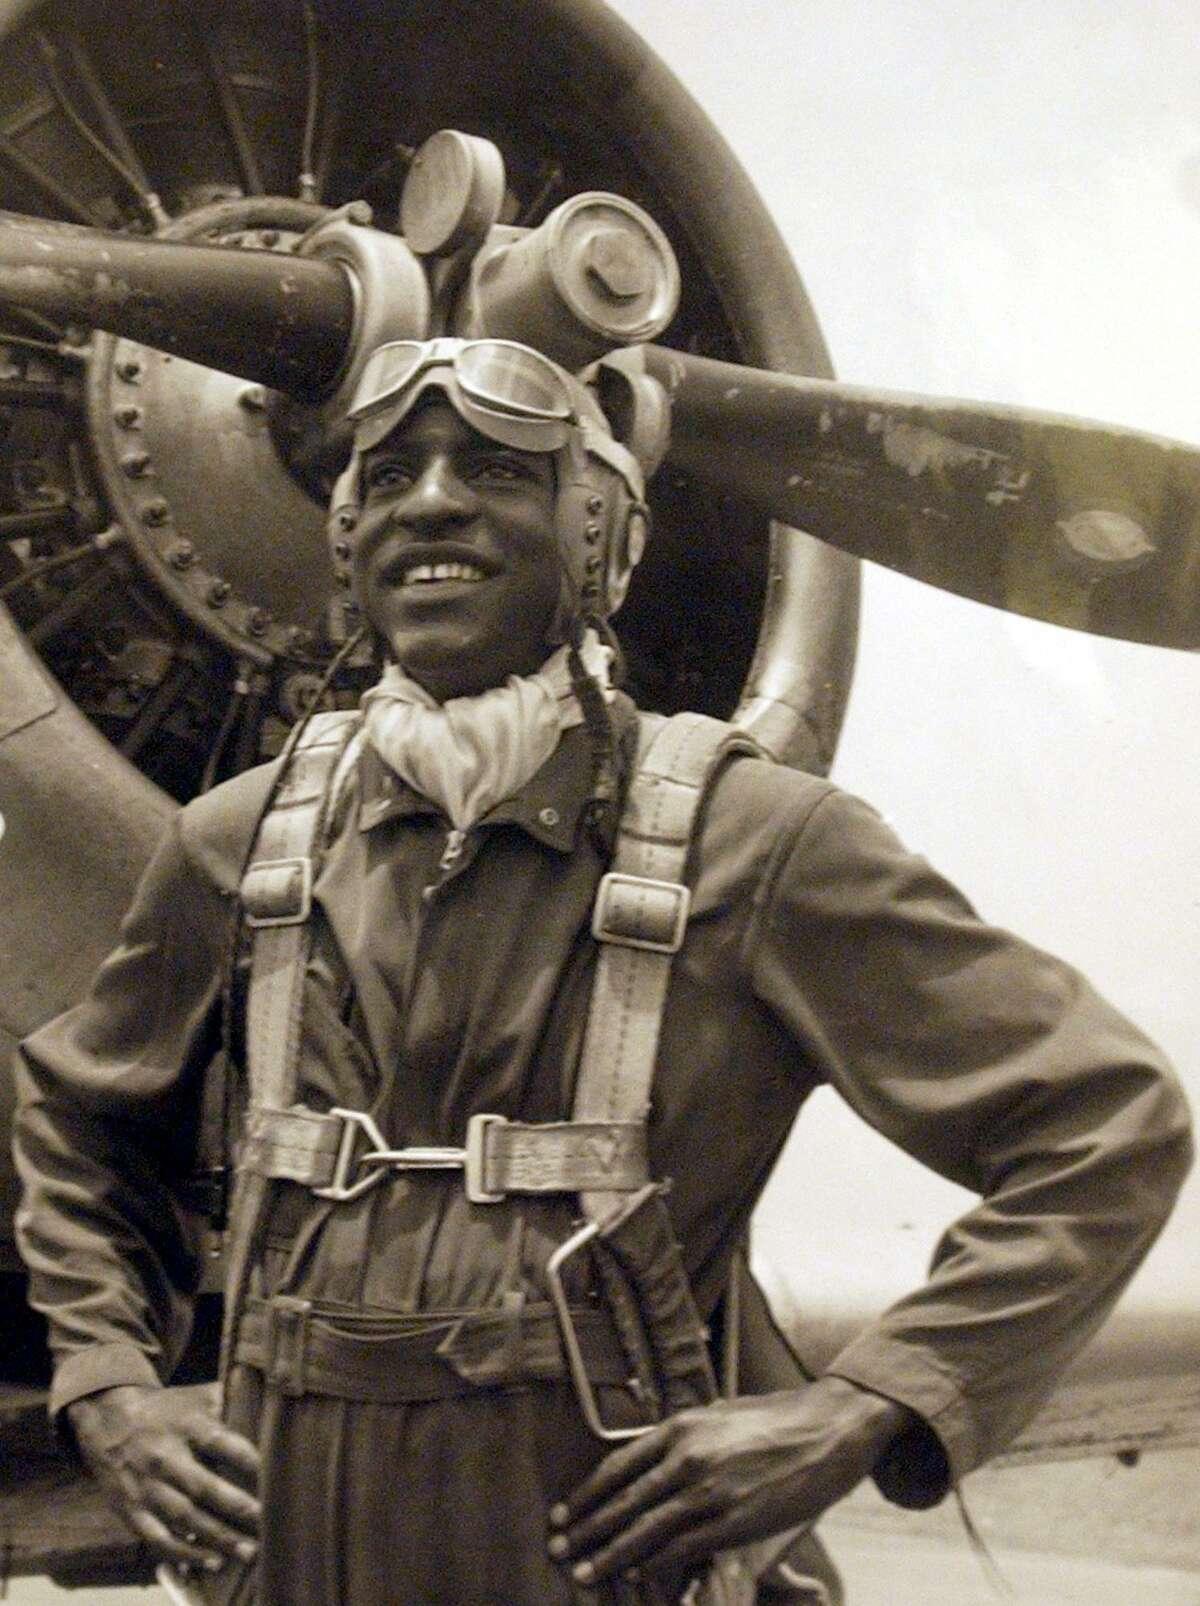 Tuskegee Airman Granville Coggs.